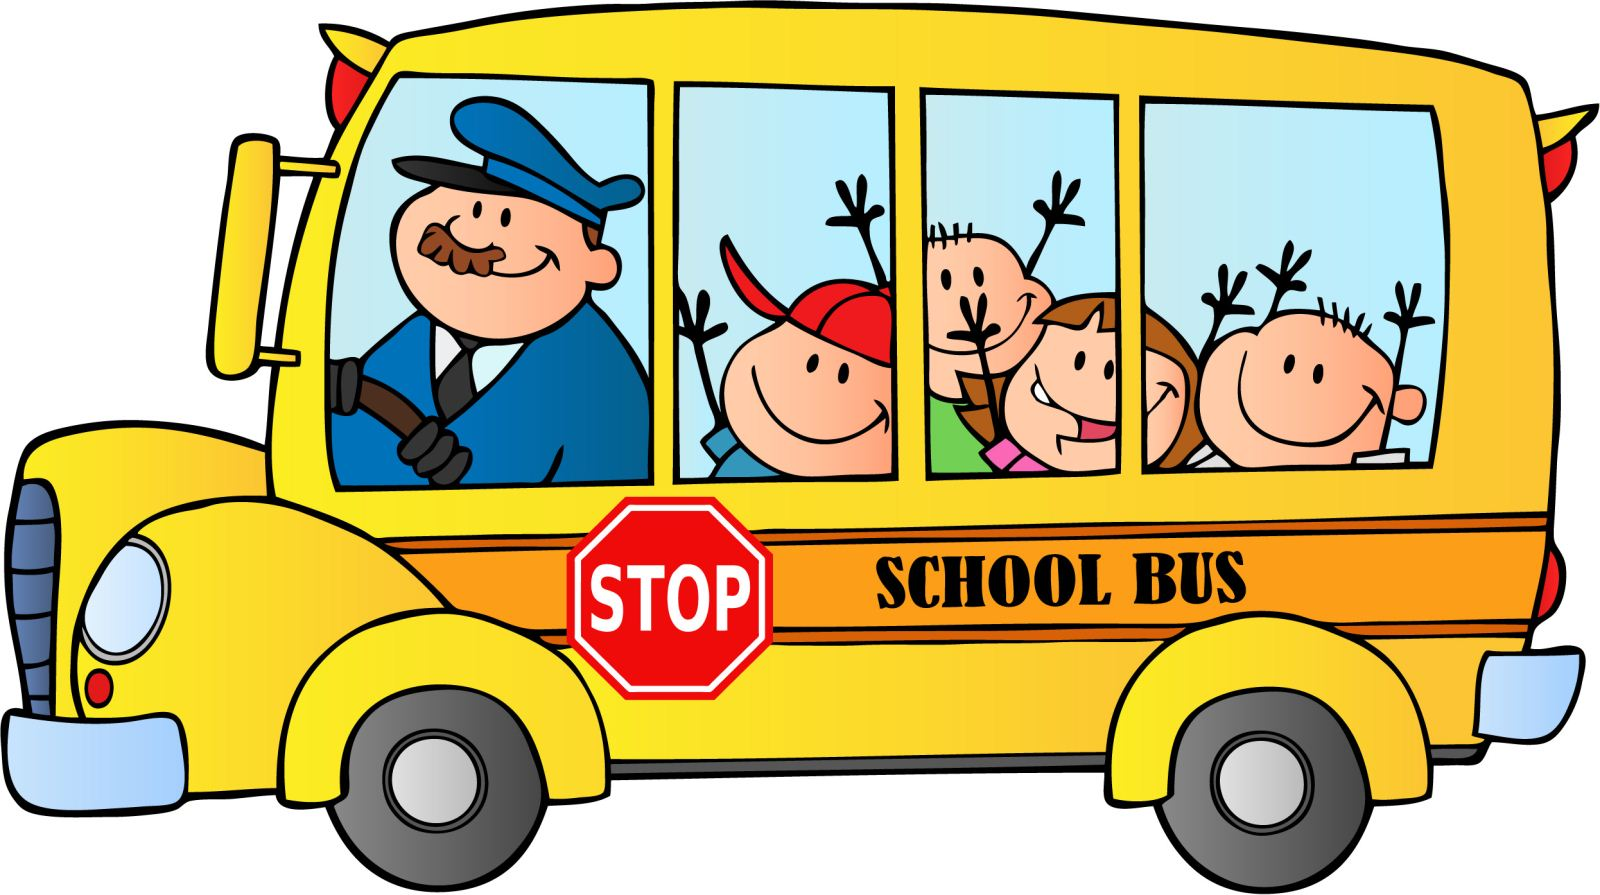 Free Kindergarten Dismissal Cliparts, Download Free Clip Art.